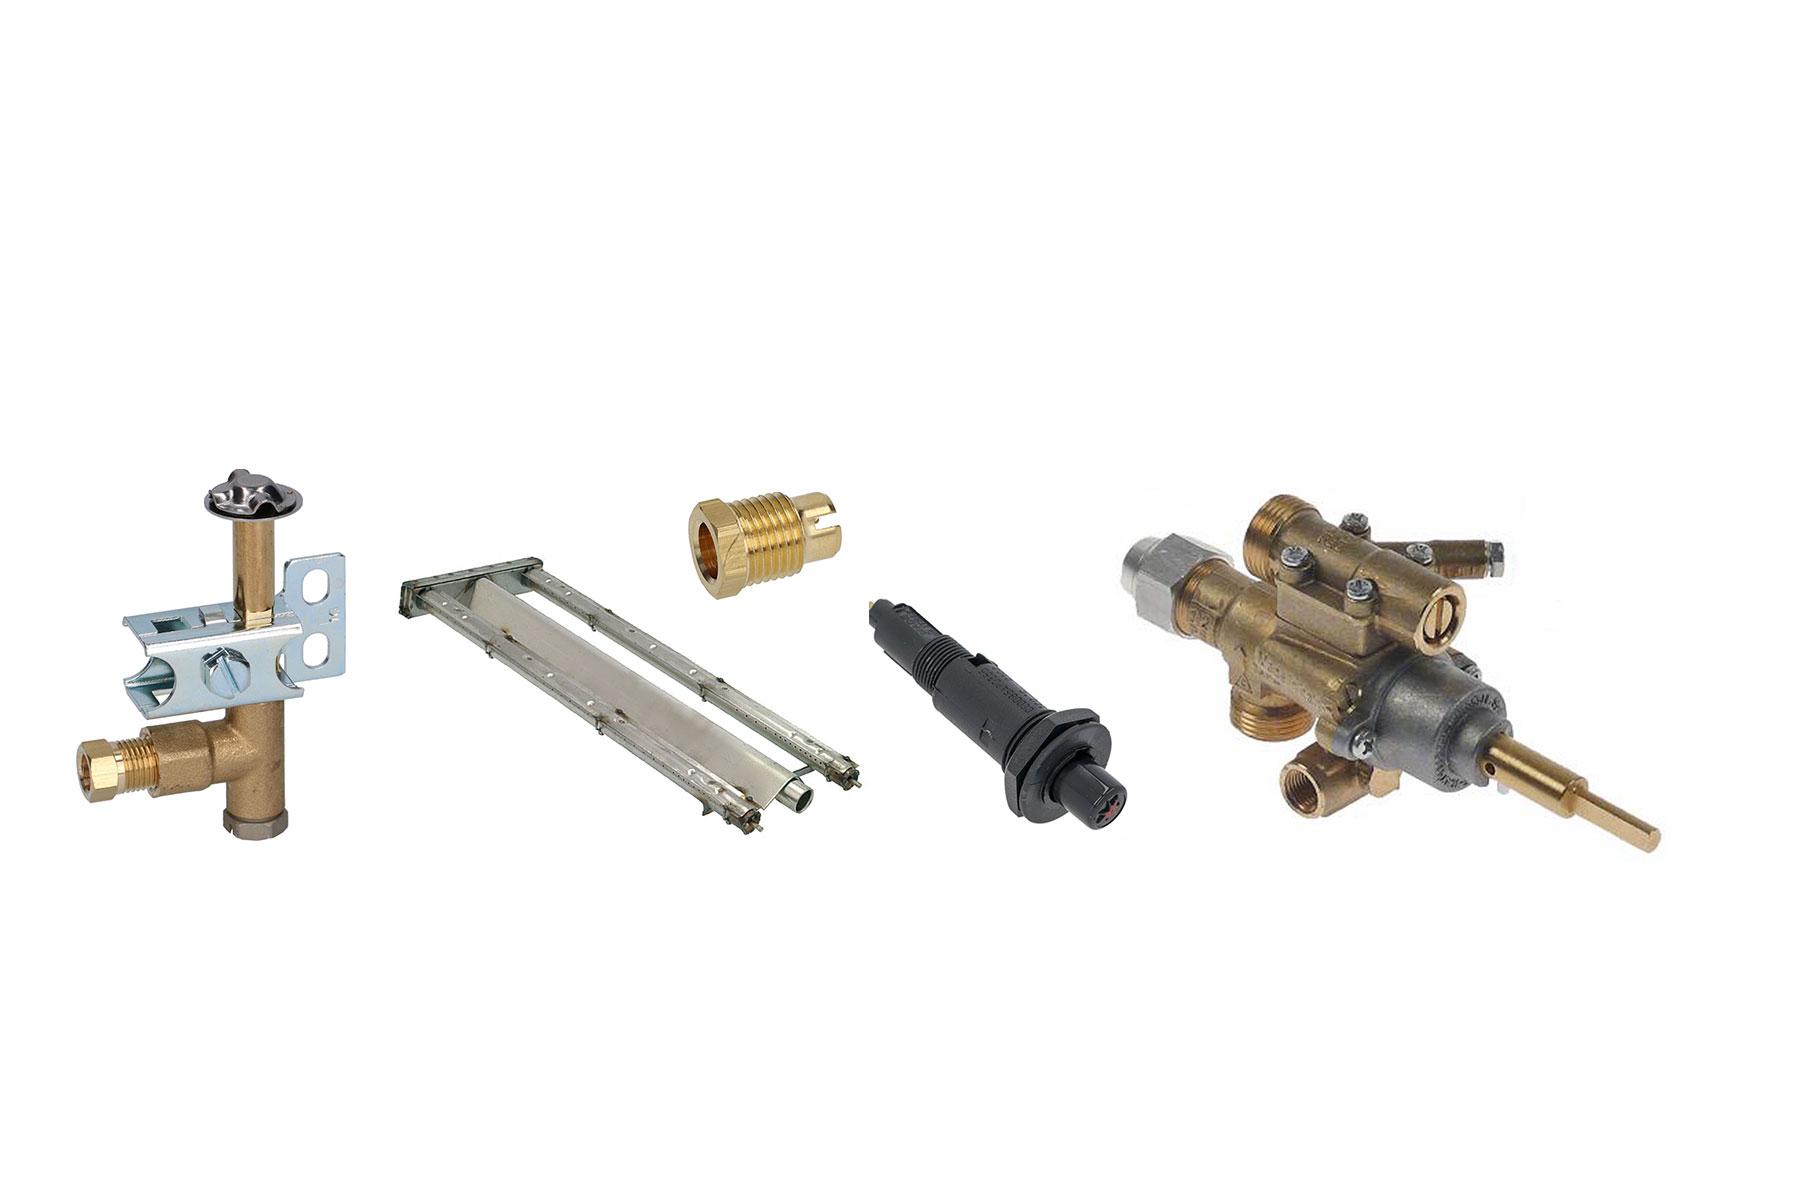 Gas komponenter